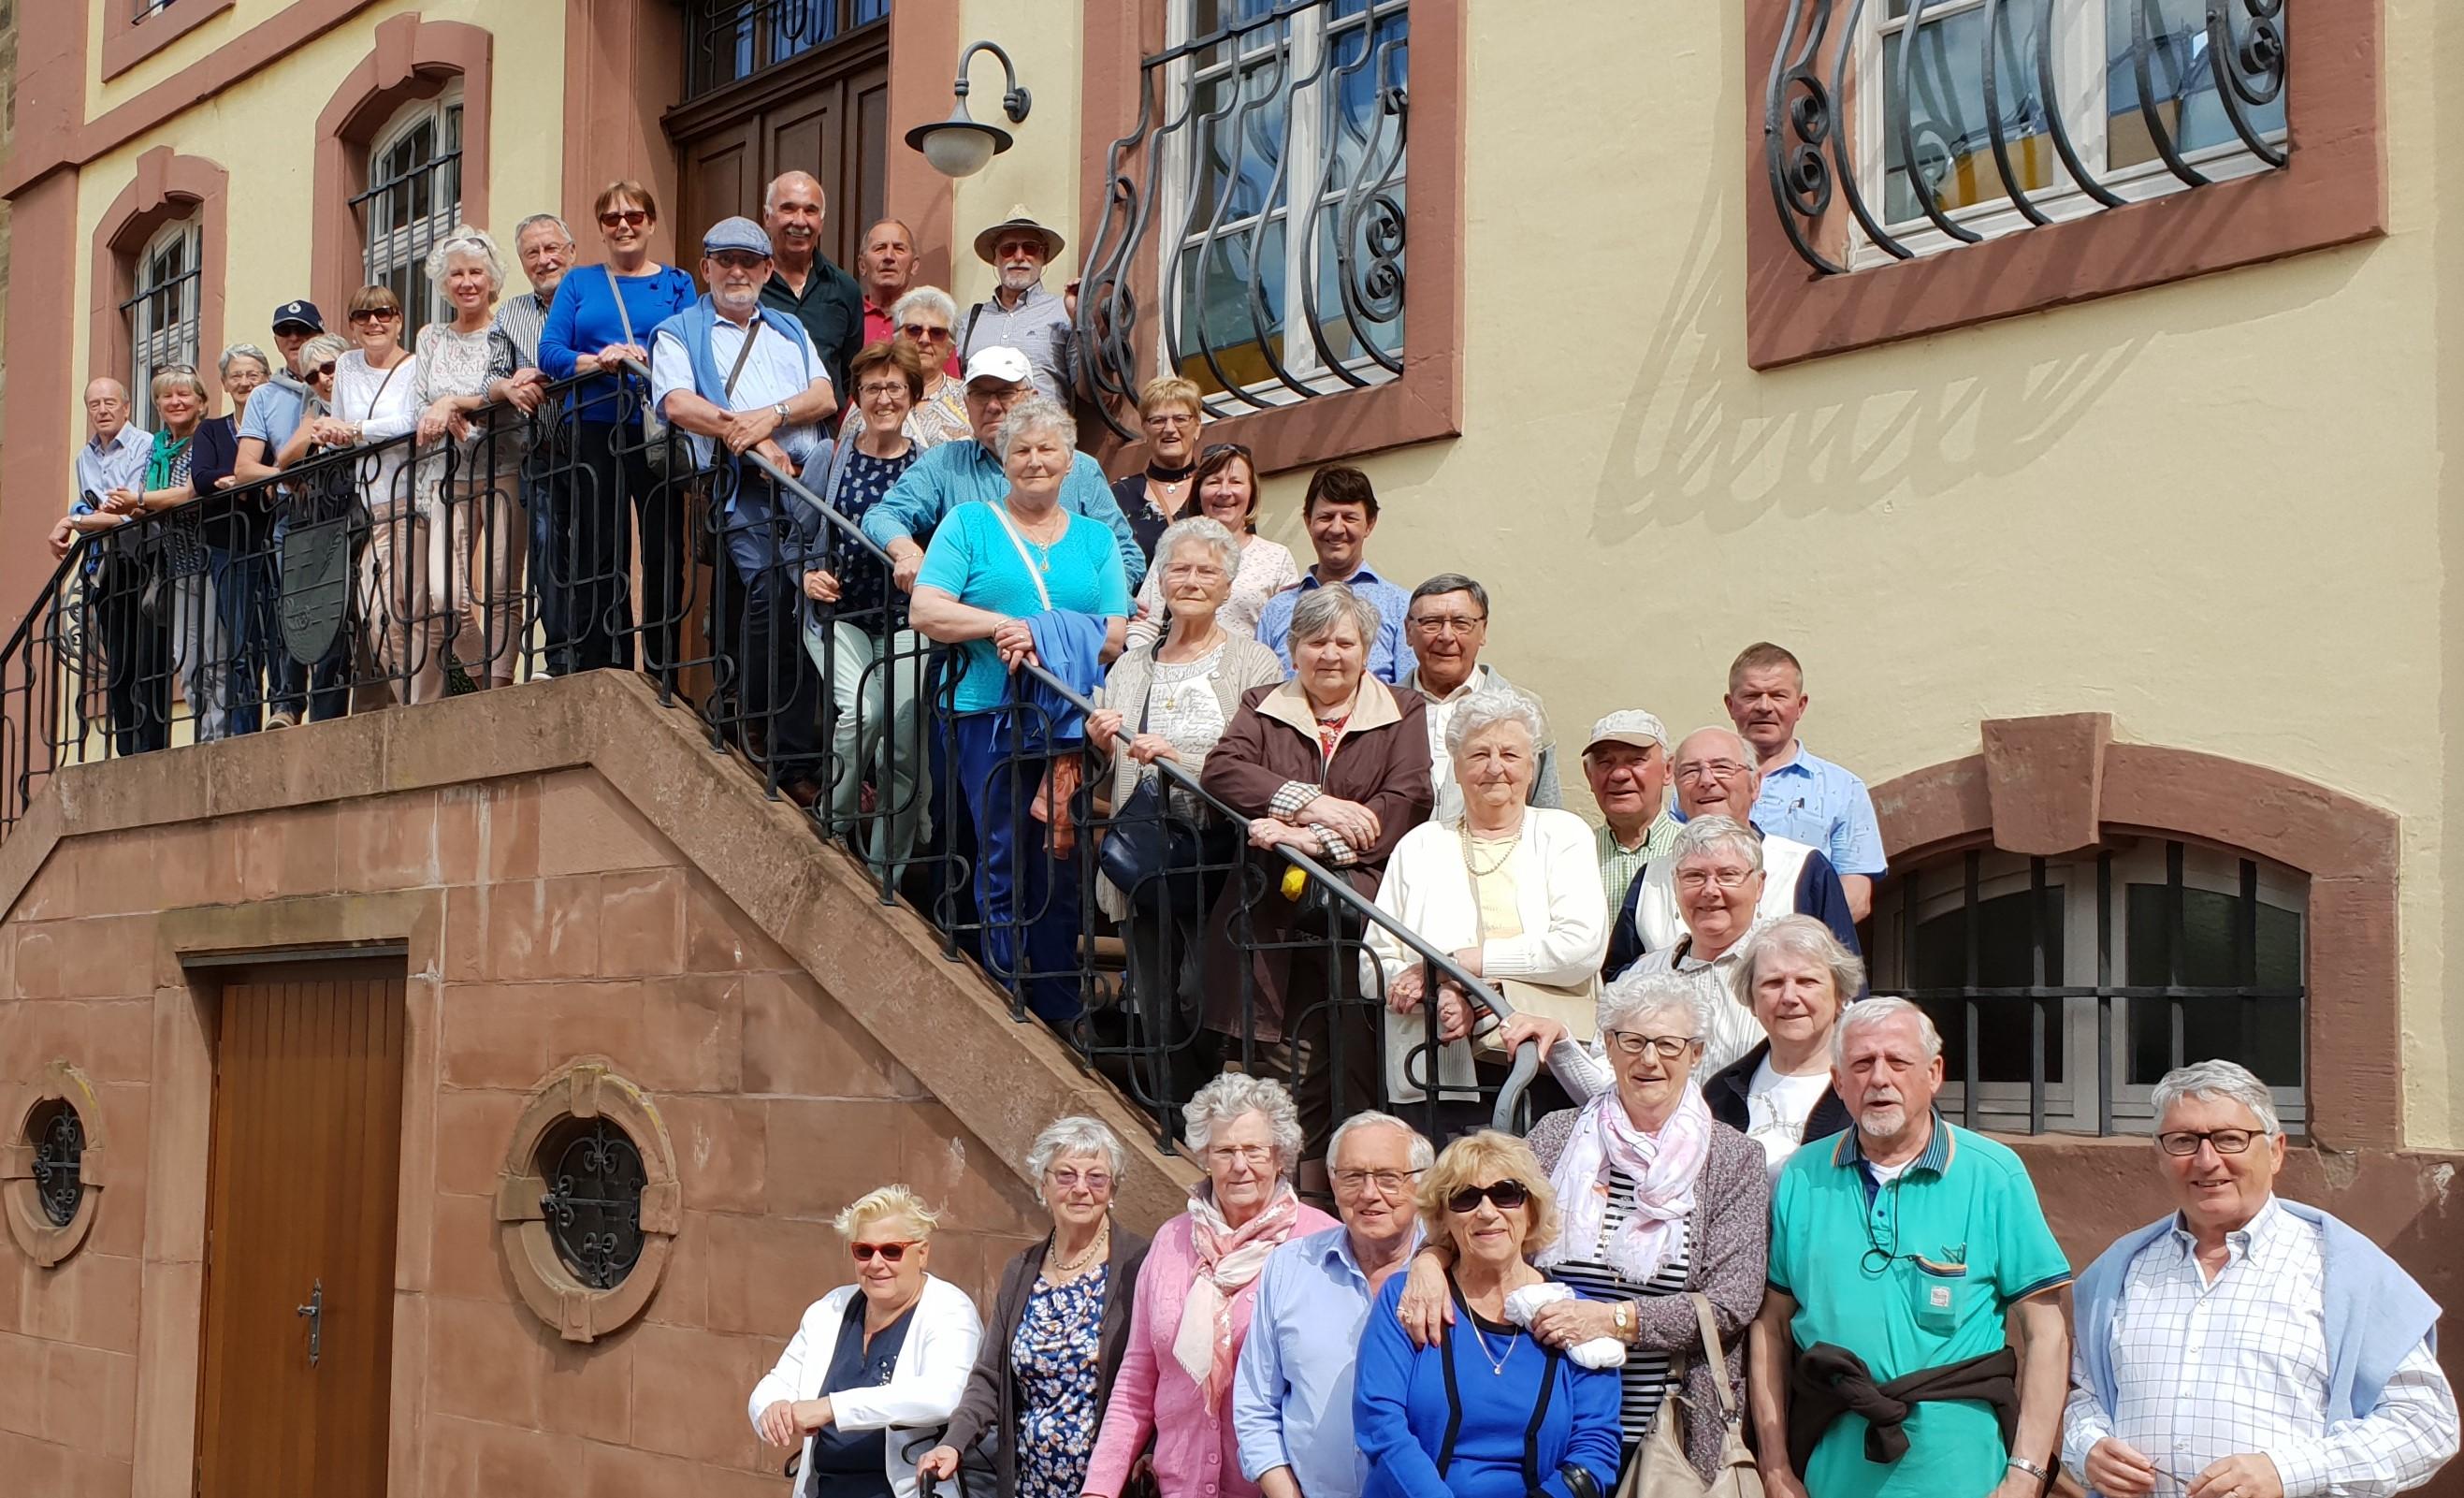 Bredense CD&V-senioren naar de Moezel